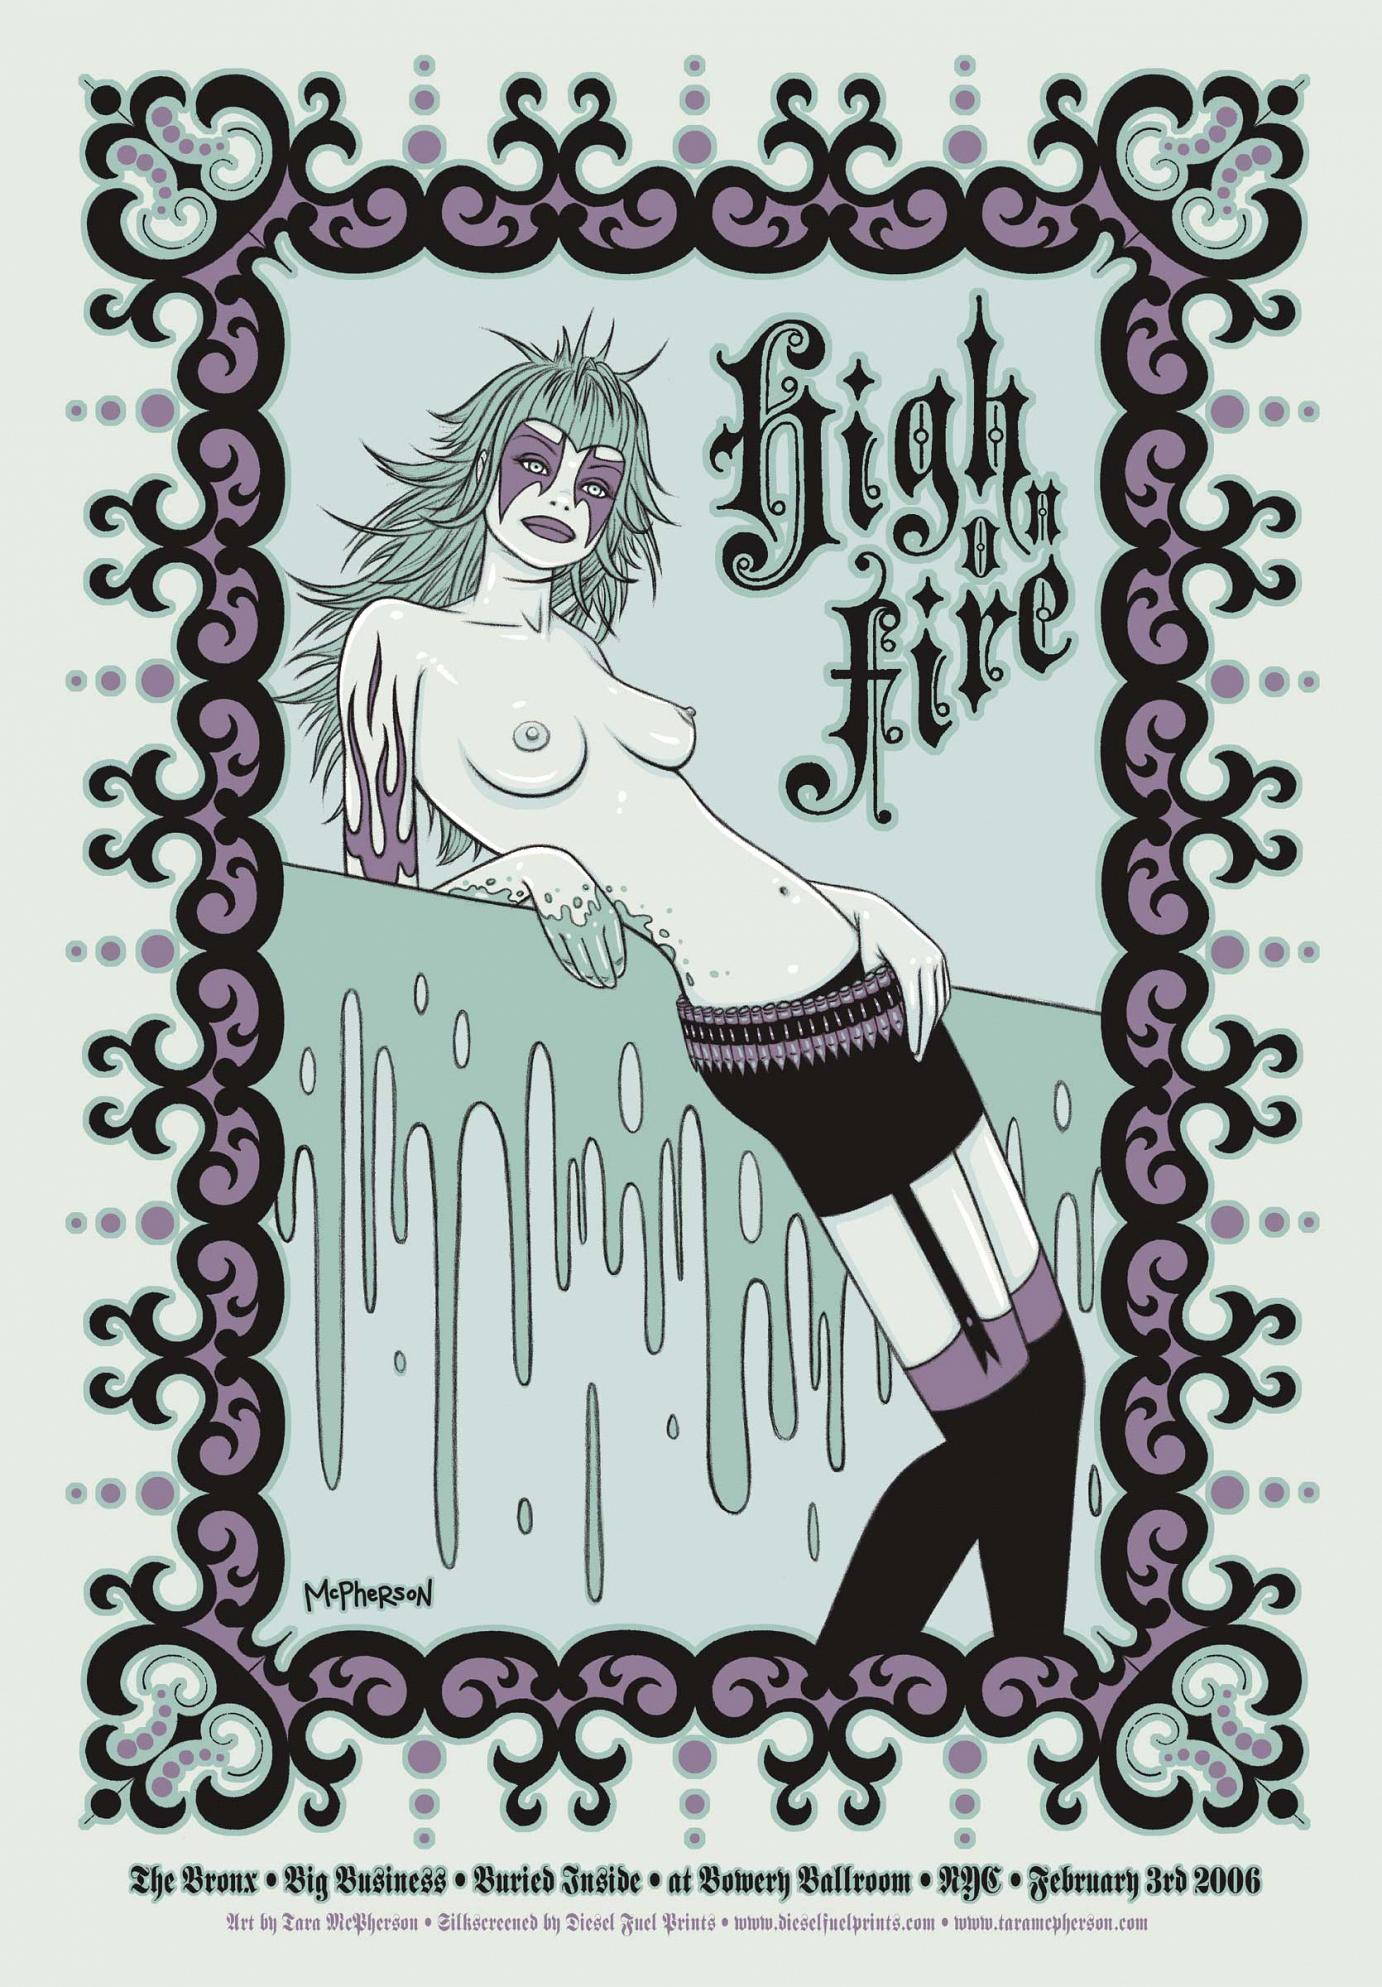 »High on Fire« von Tara McPherson | 5 Color Silkscreen | 40,64 x 58,42cm | Edition of 300 | 2006